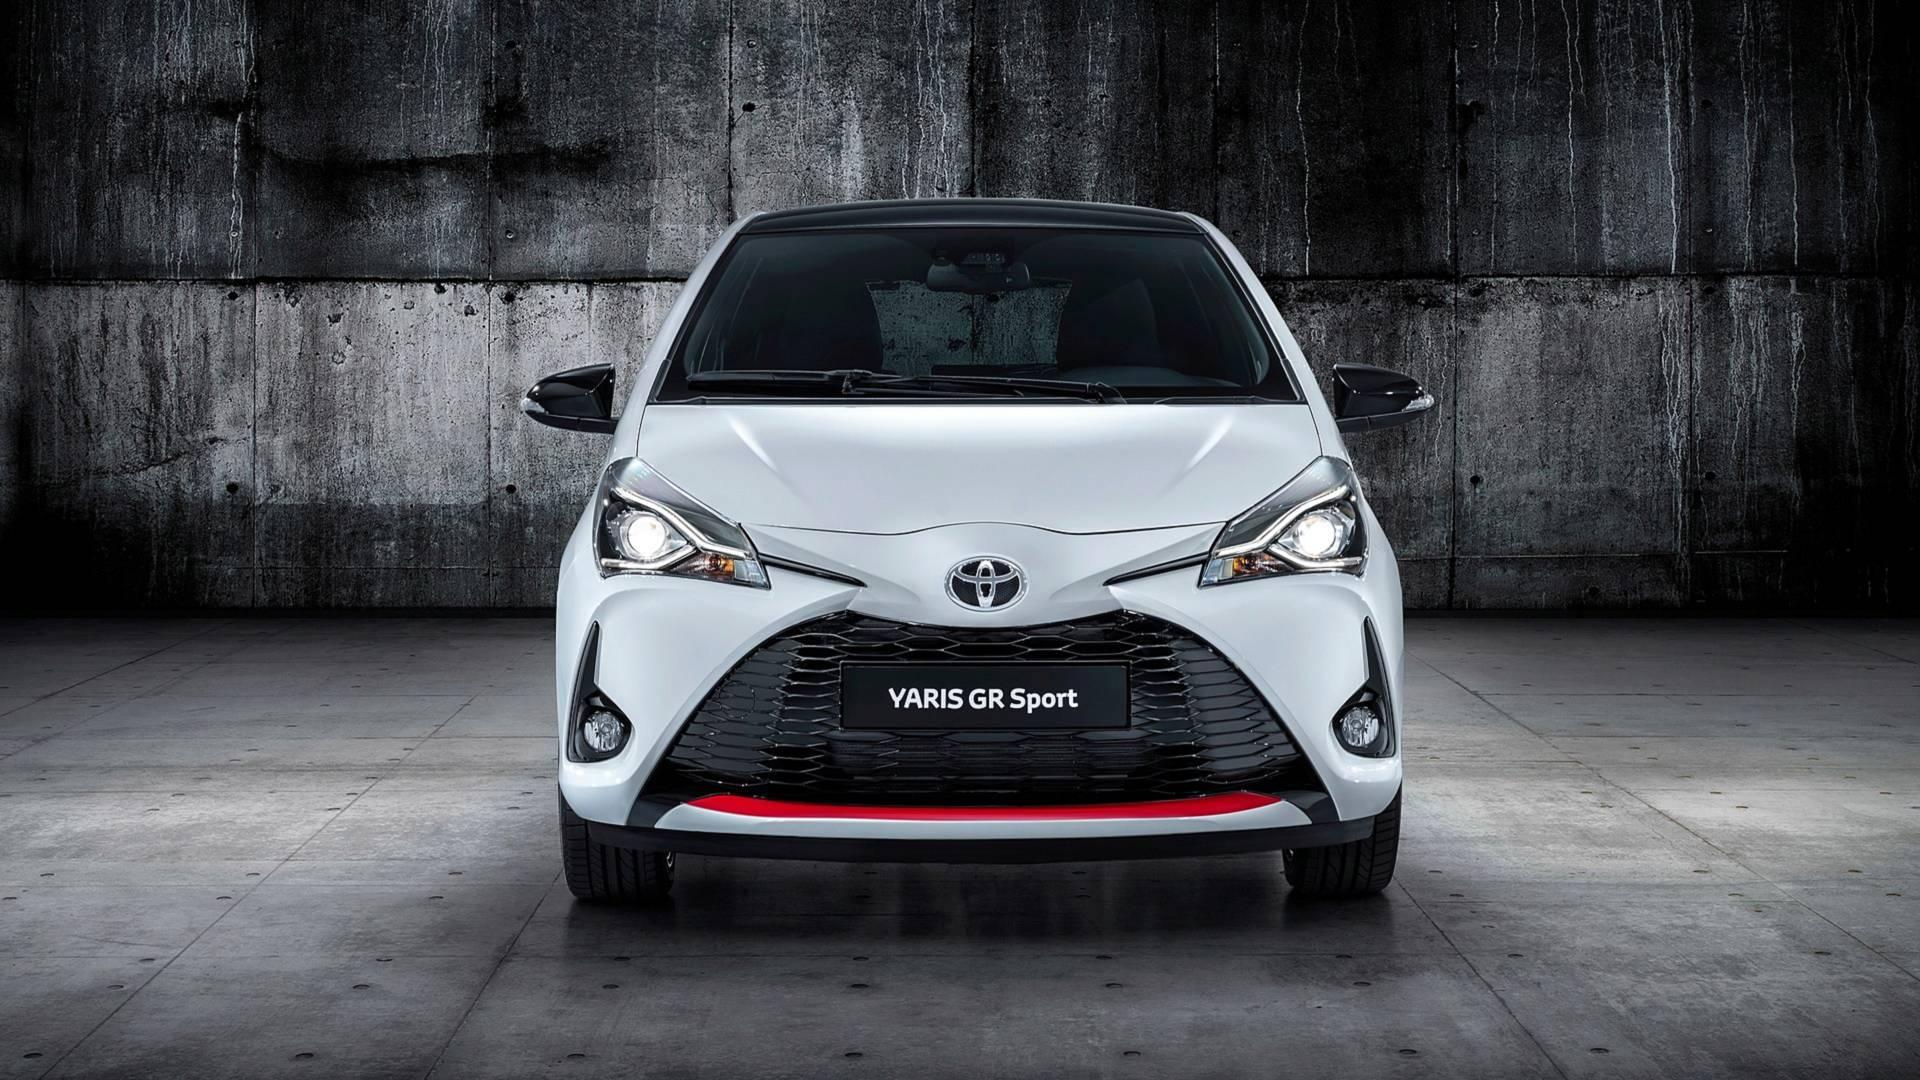 2019 Toyota Yaris Gr Sport Isn T Your Average Hybrid Hatchback